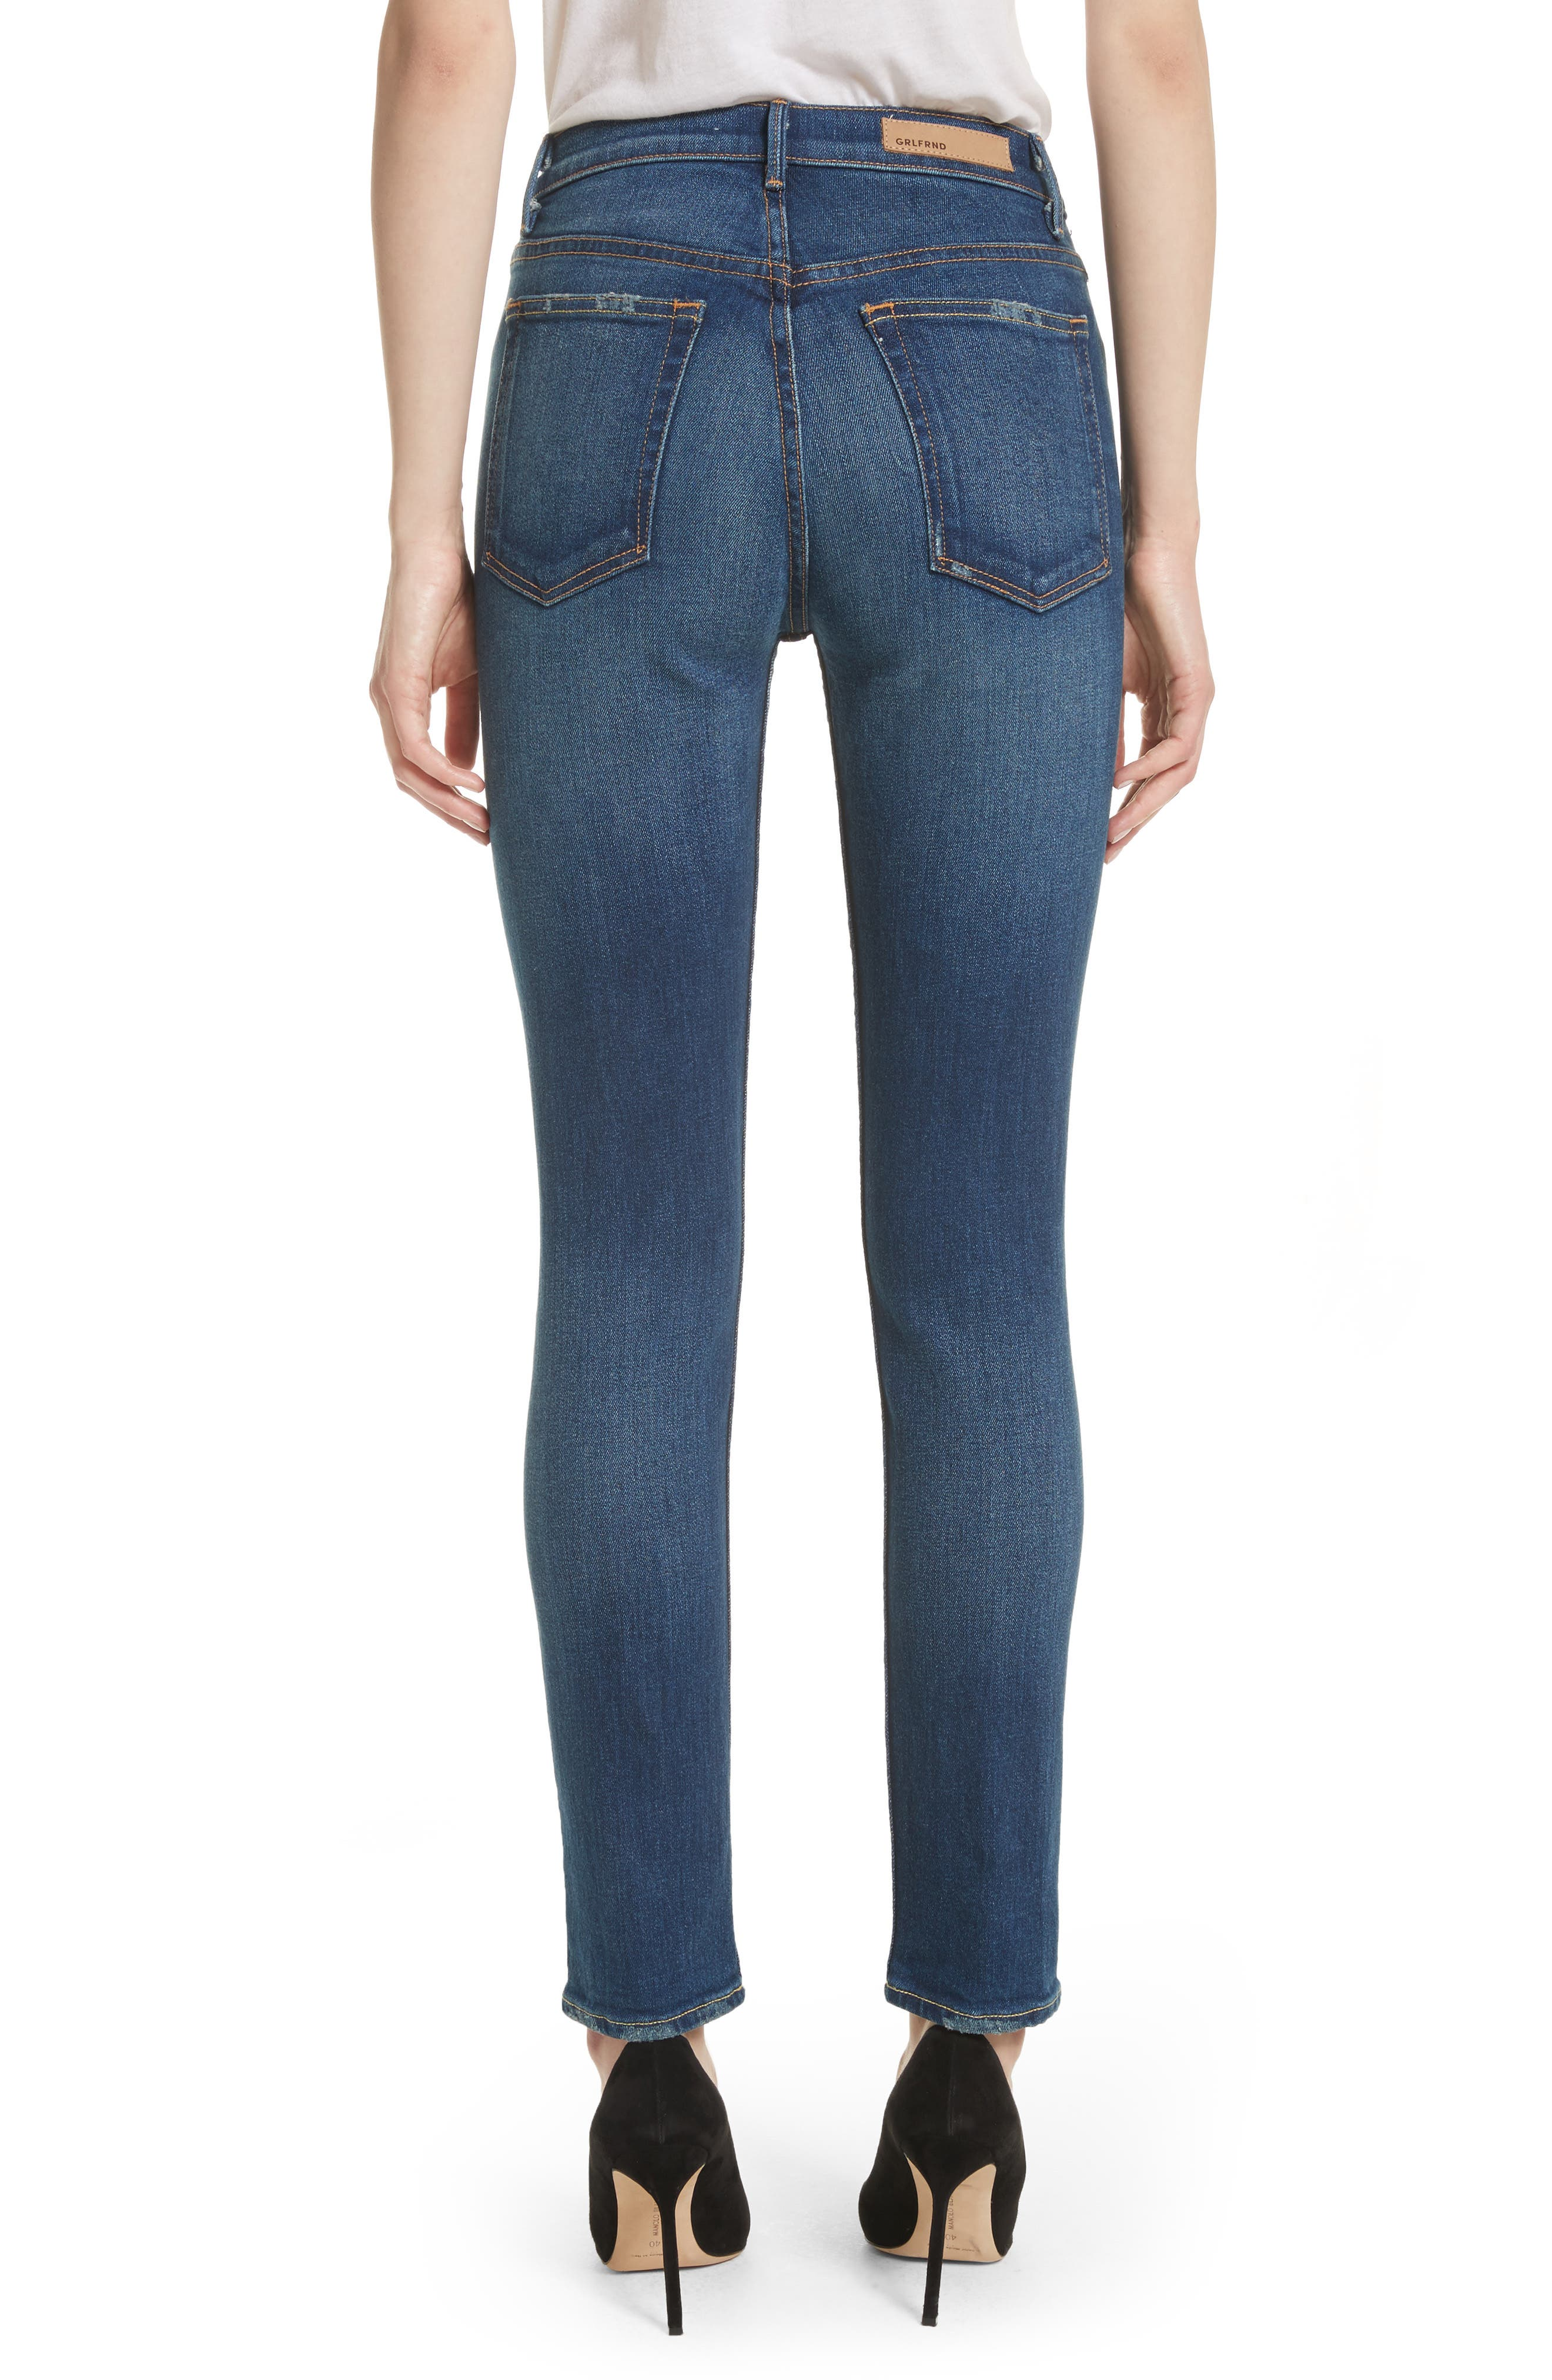 Karolina High Waist Skinny Jeans,                             Alternate thumbnail 2, color,                             JOAN JETT